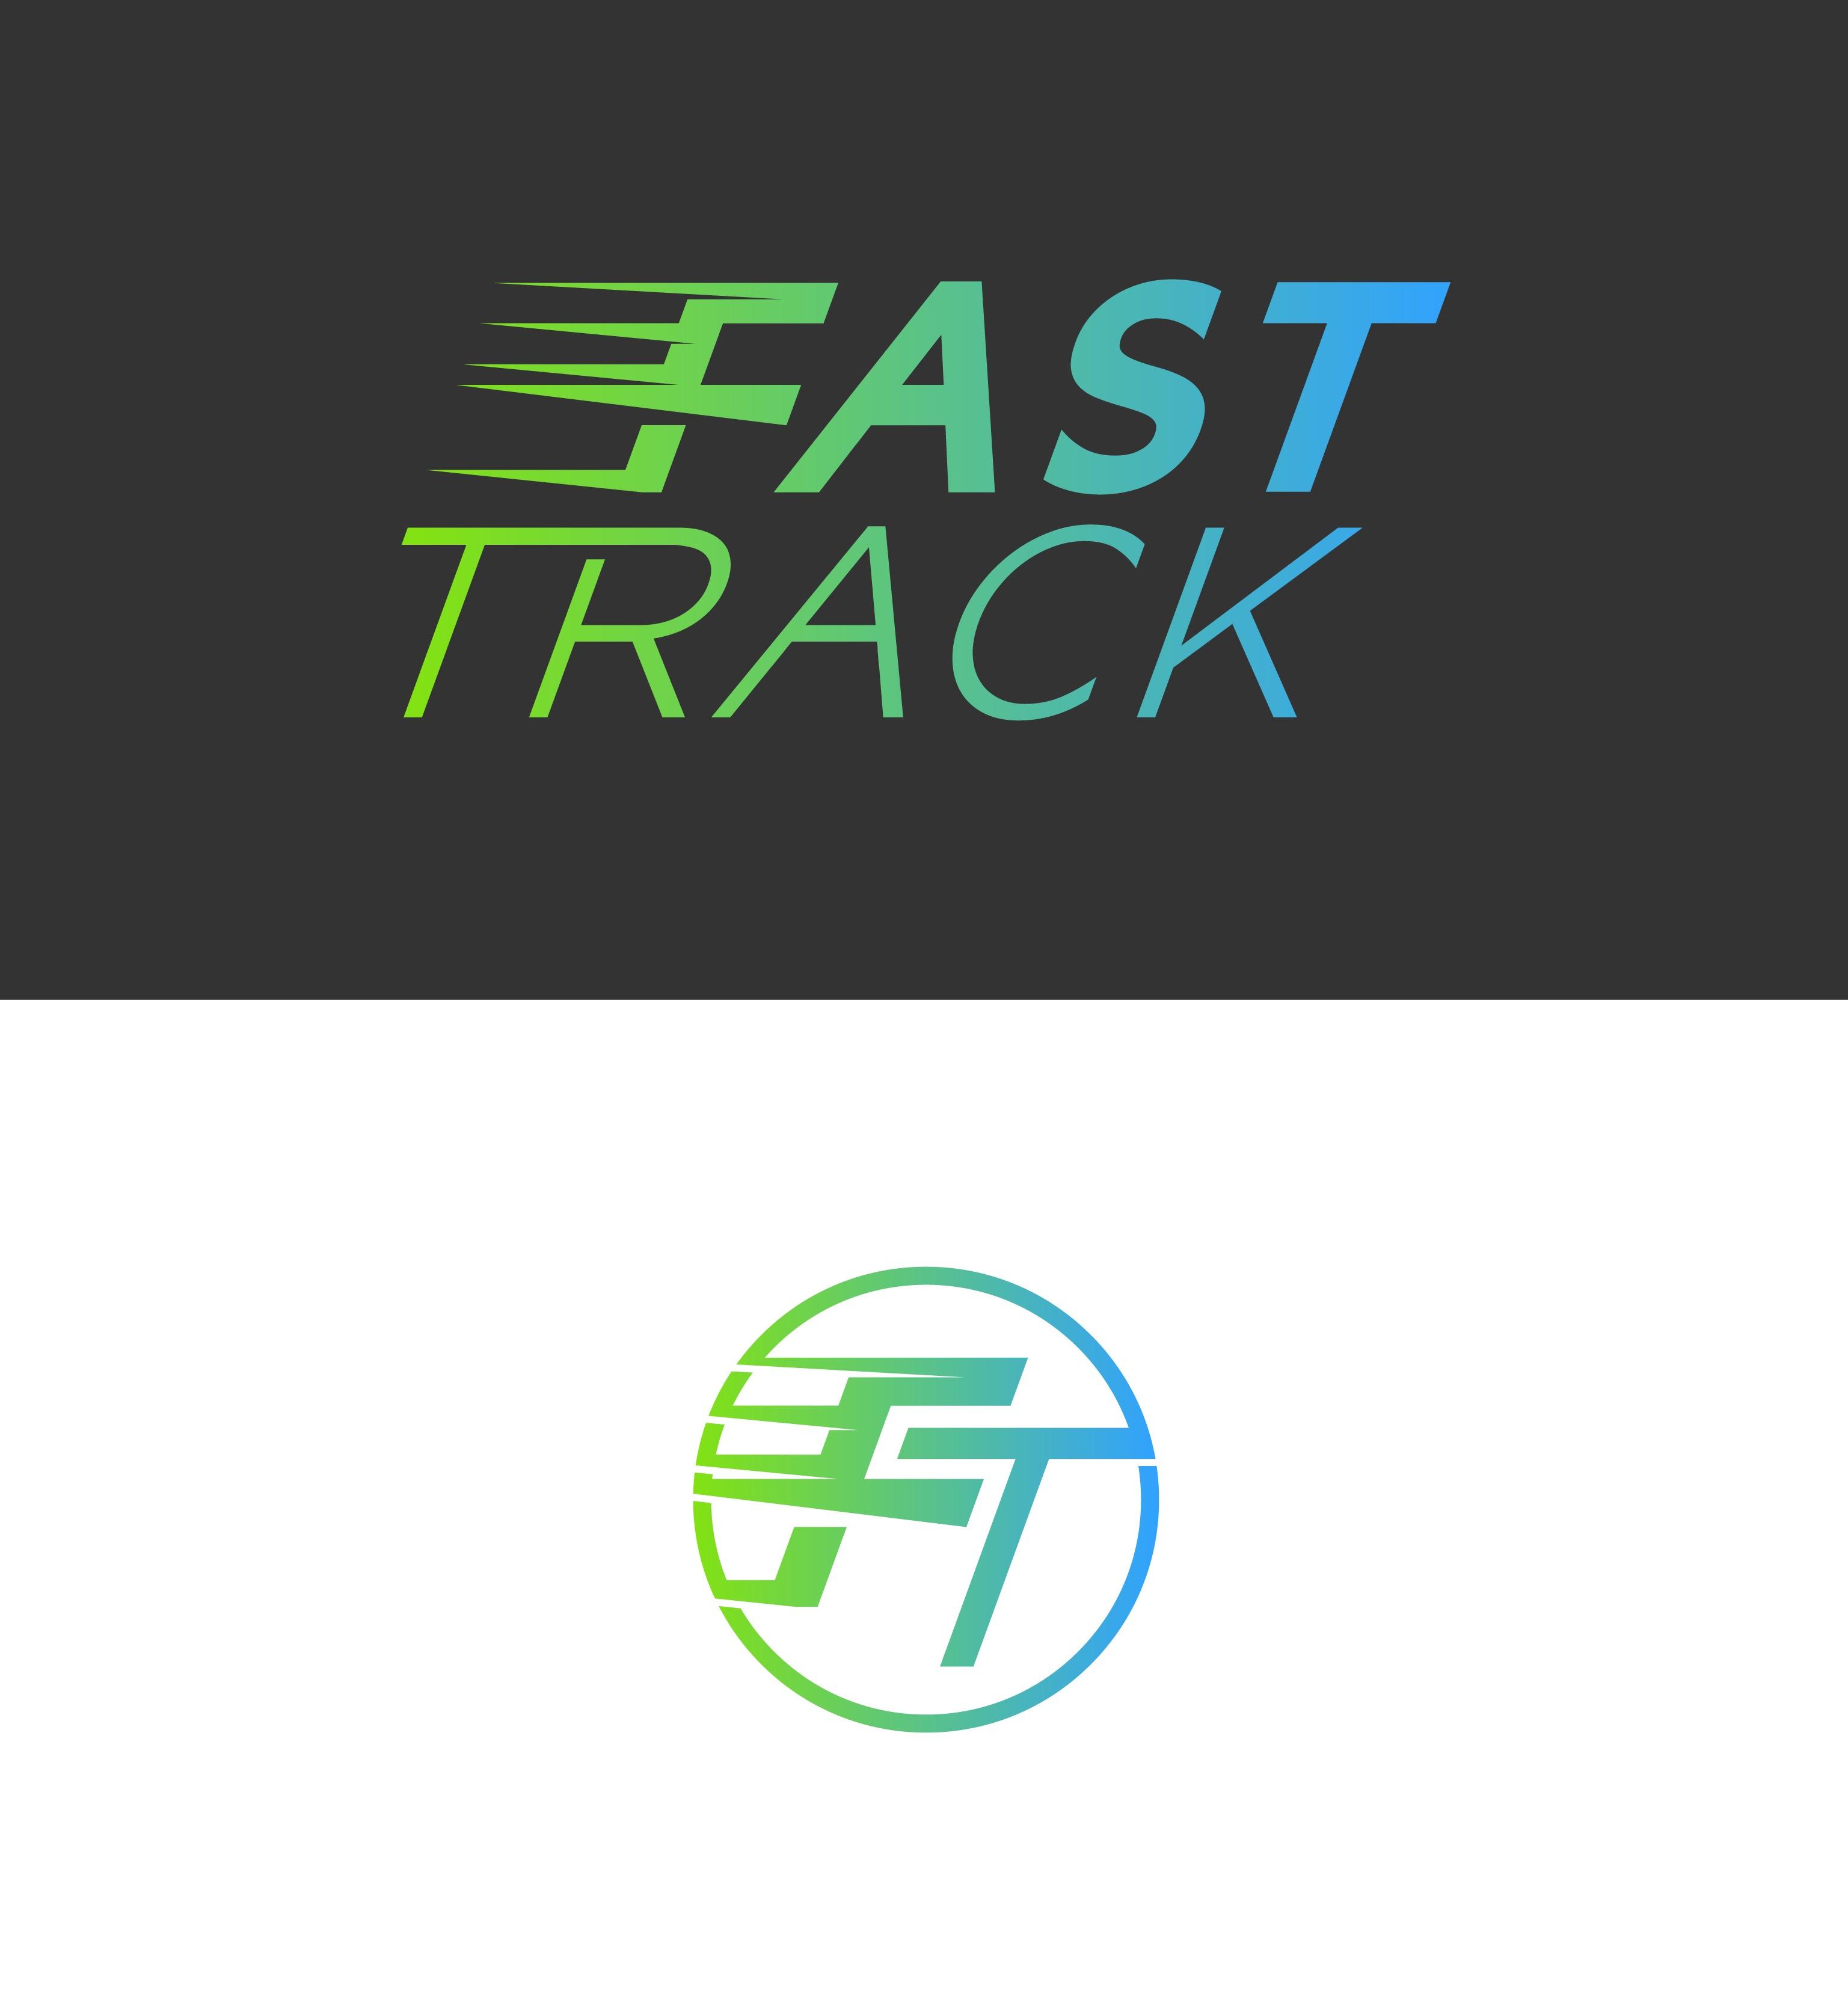 fast-track-logo.jpg